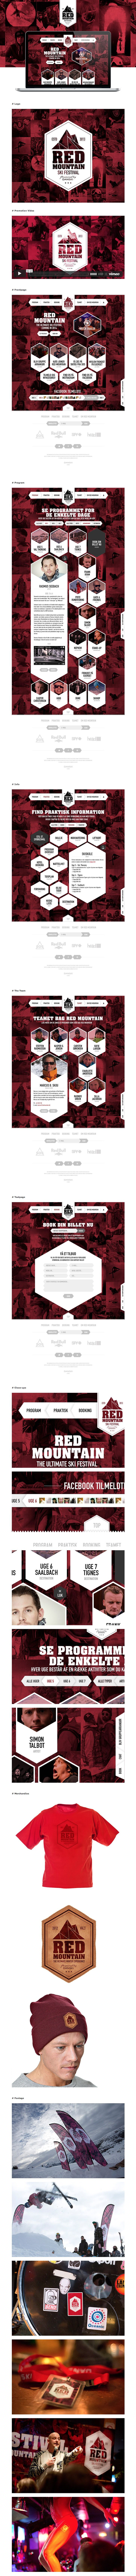 RedMountain - Ski Festival #Branding #InteractionDesign #UI #UX #Interface - http://www.behance.net/gallery/RedMountain-Ski-Festival/8685631